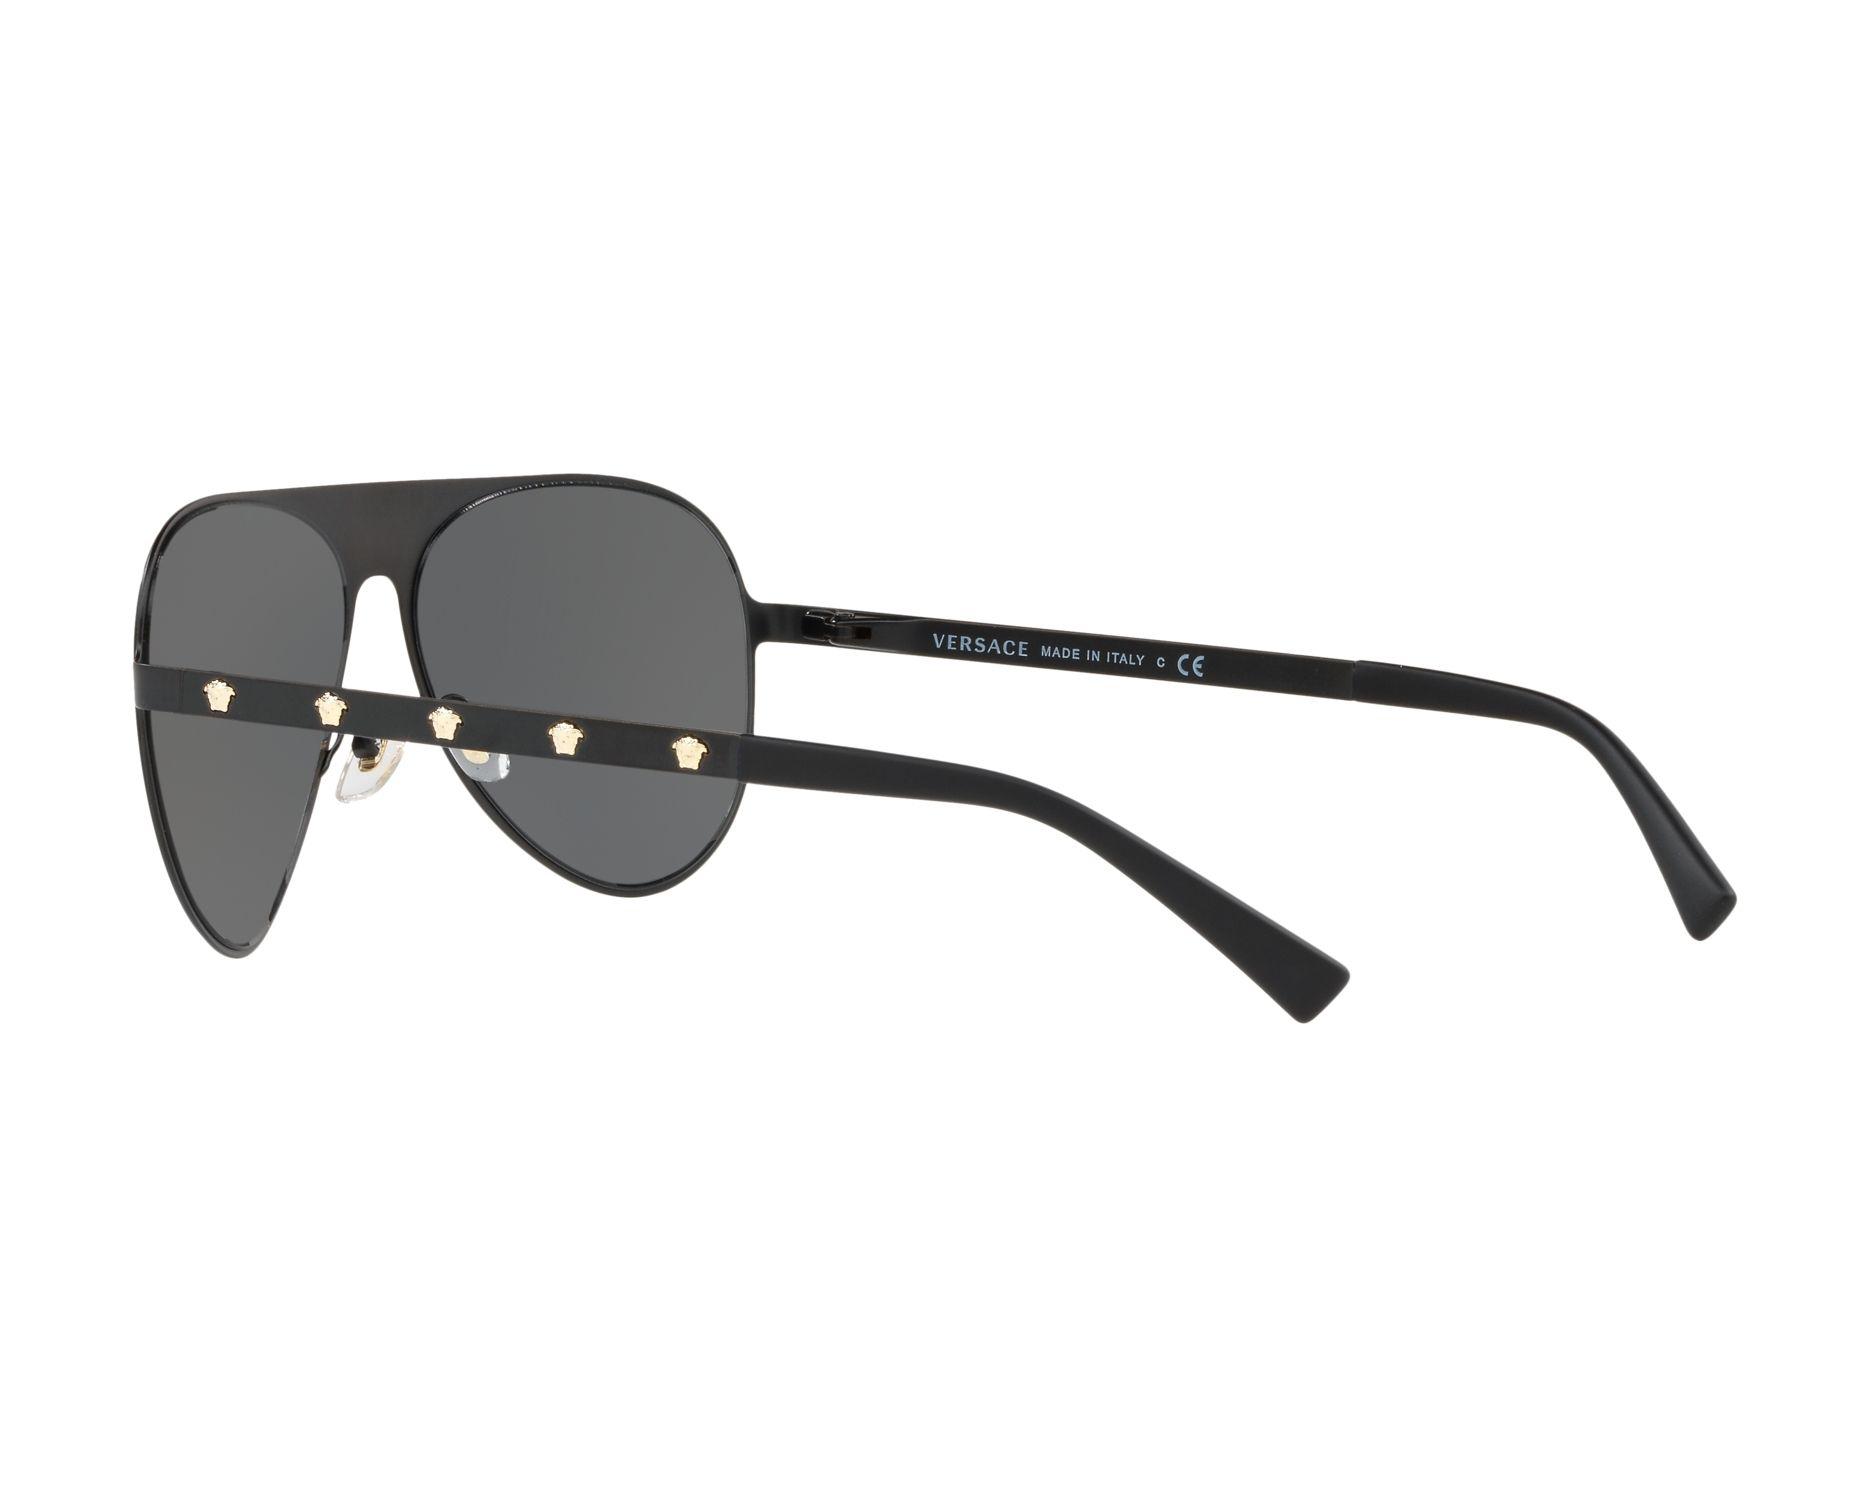 da2c6eda3e5 Sunglasses Versace VE-2189 142587 59-14 Black Gold 360 degree view 5